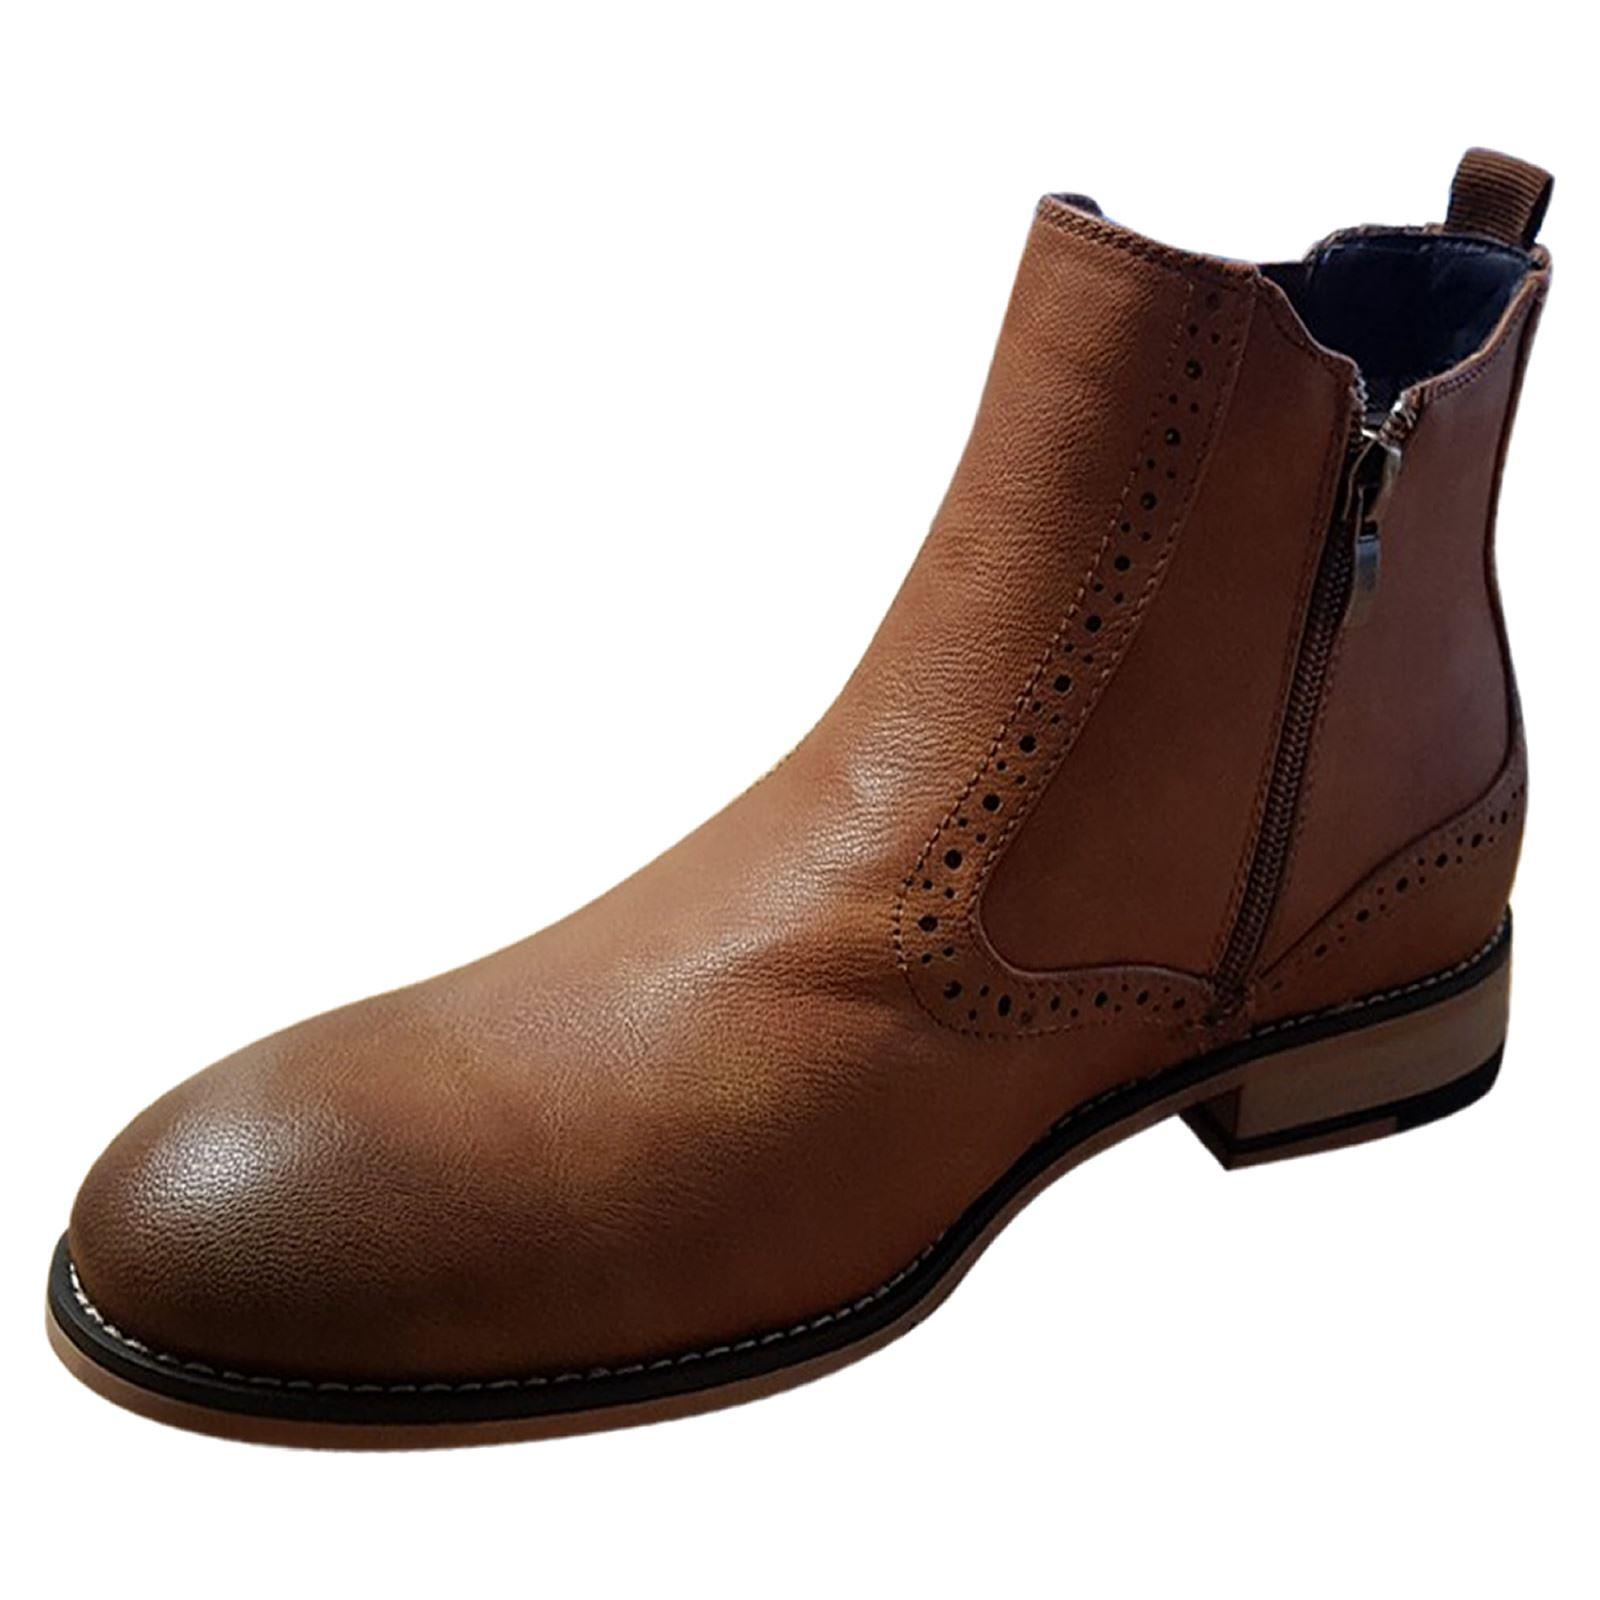 miniature 7 - Homme-Bottines-Chelsea-CAVANI-Fox-Aspect-Cuir-Slip-On-Classic-Mod-Chaussures